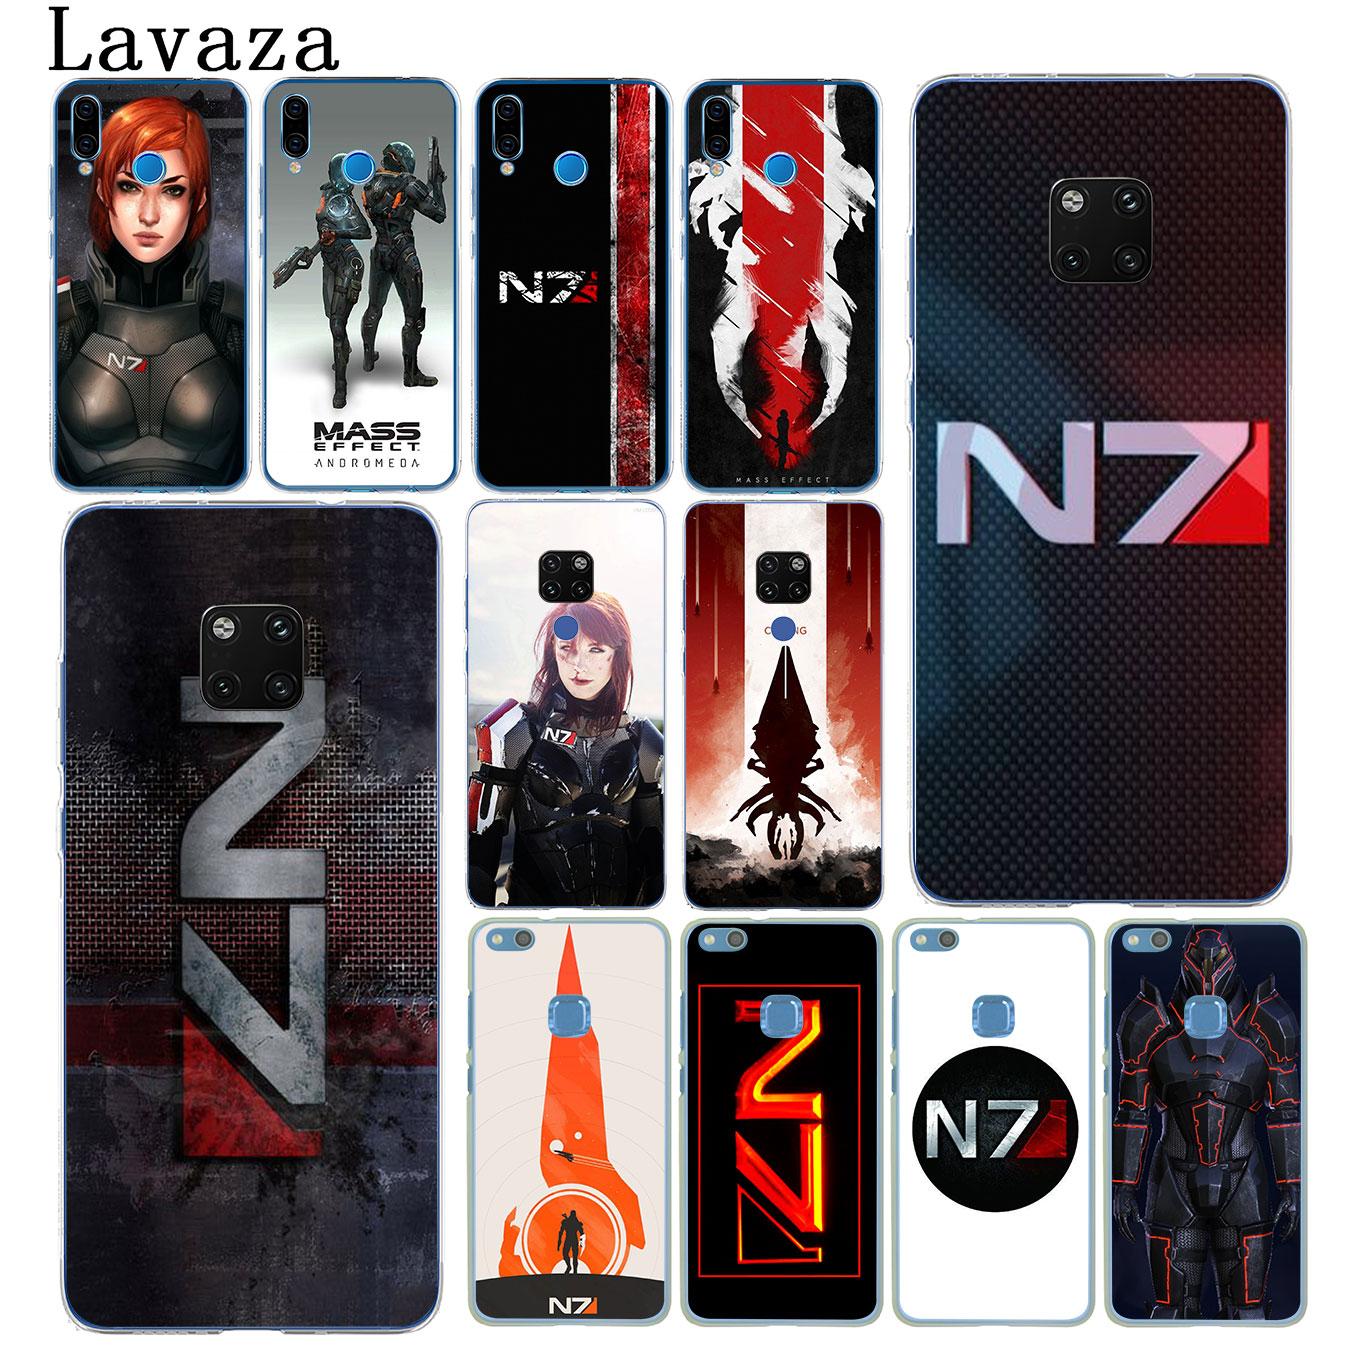 Lavaza N7 masa efecto duro caja del teléfono para Huawei Mate 30 20 Pro 10 Lite Y6 primer Nova 5I 4 3i 3 2i 2 Lite funda